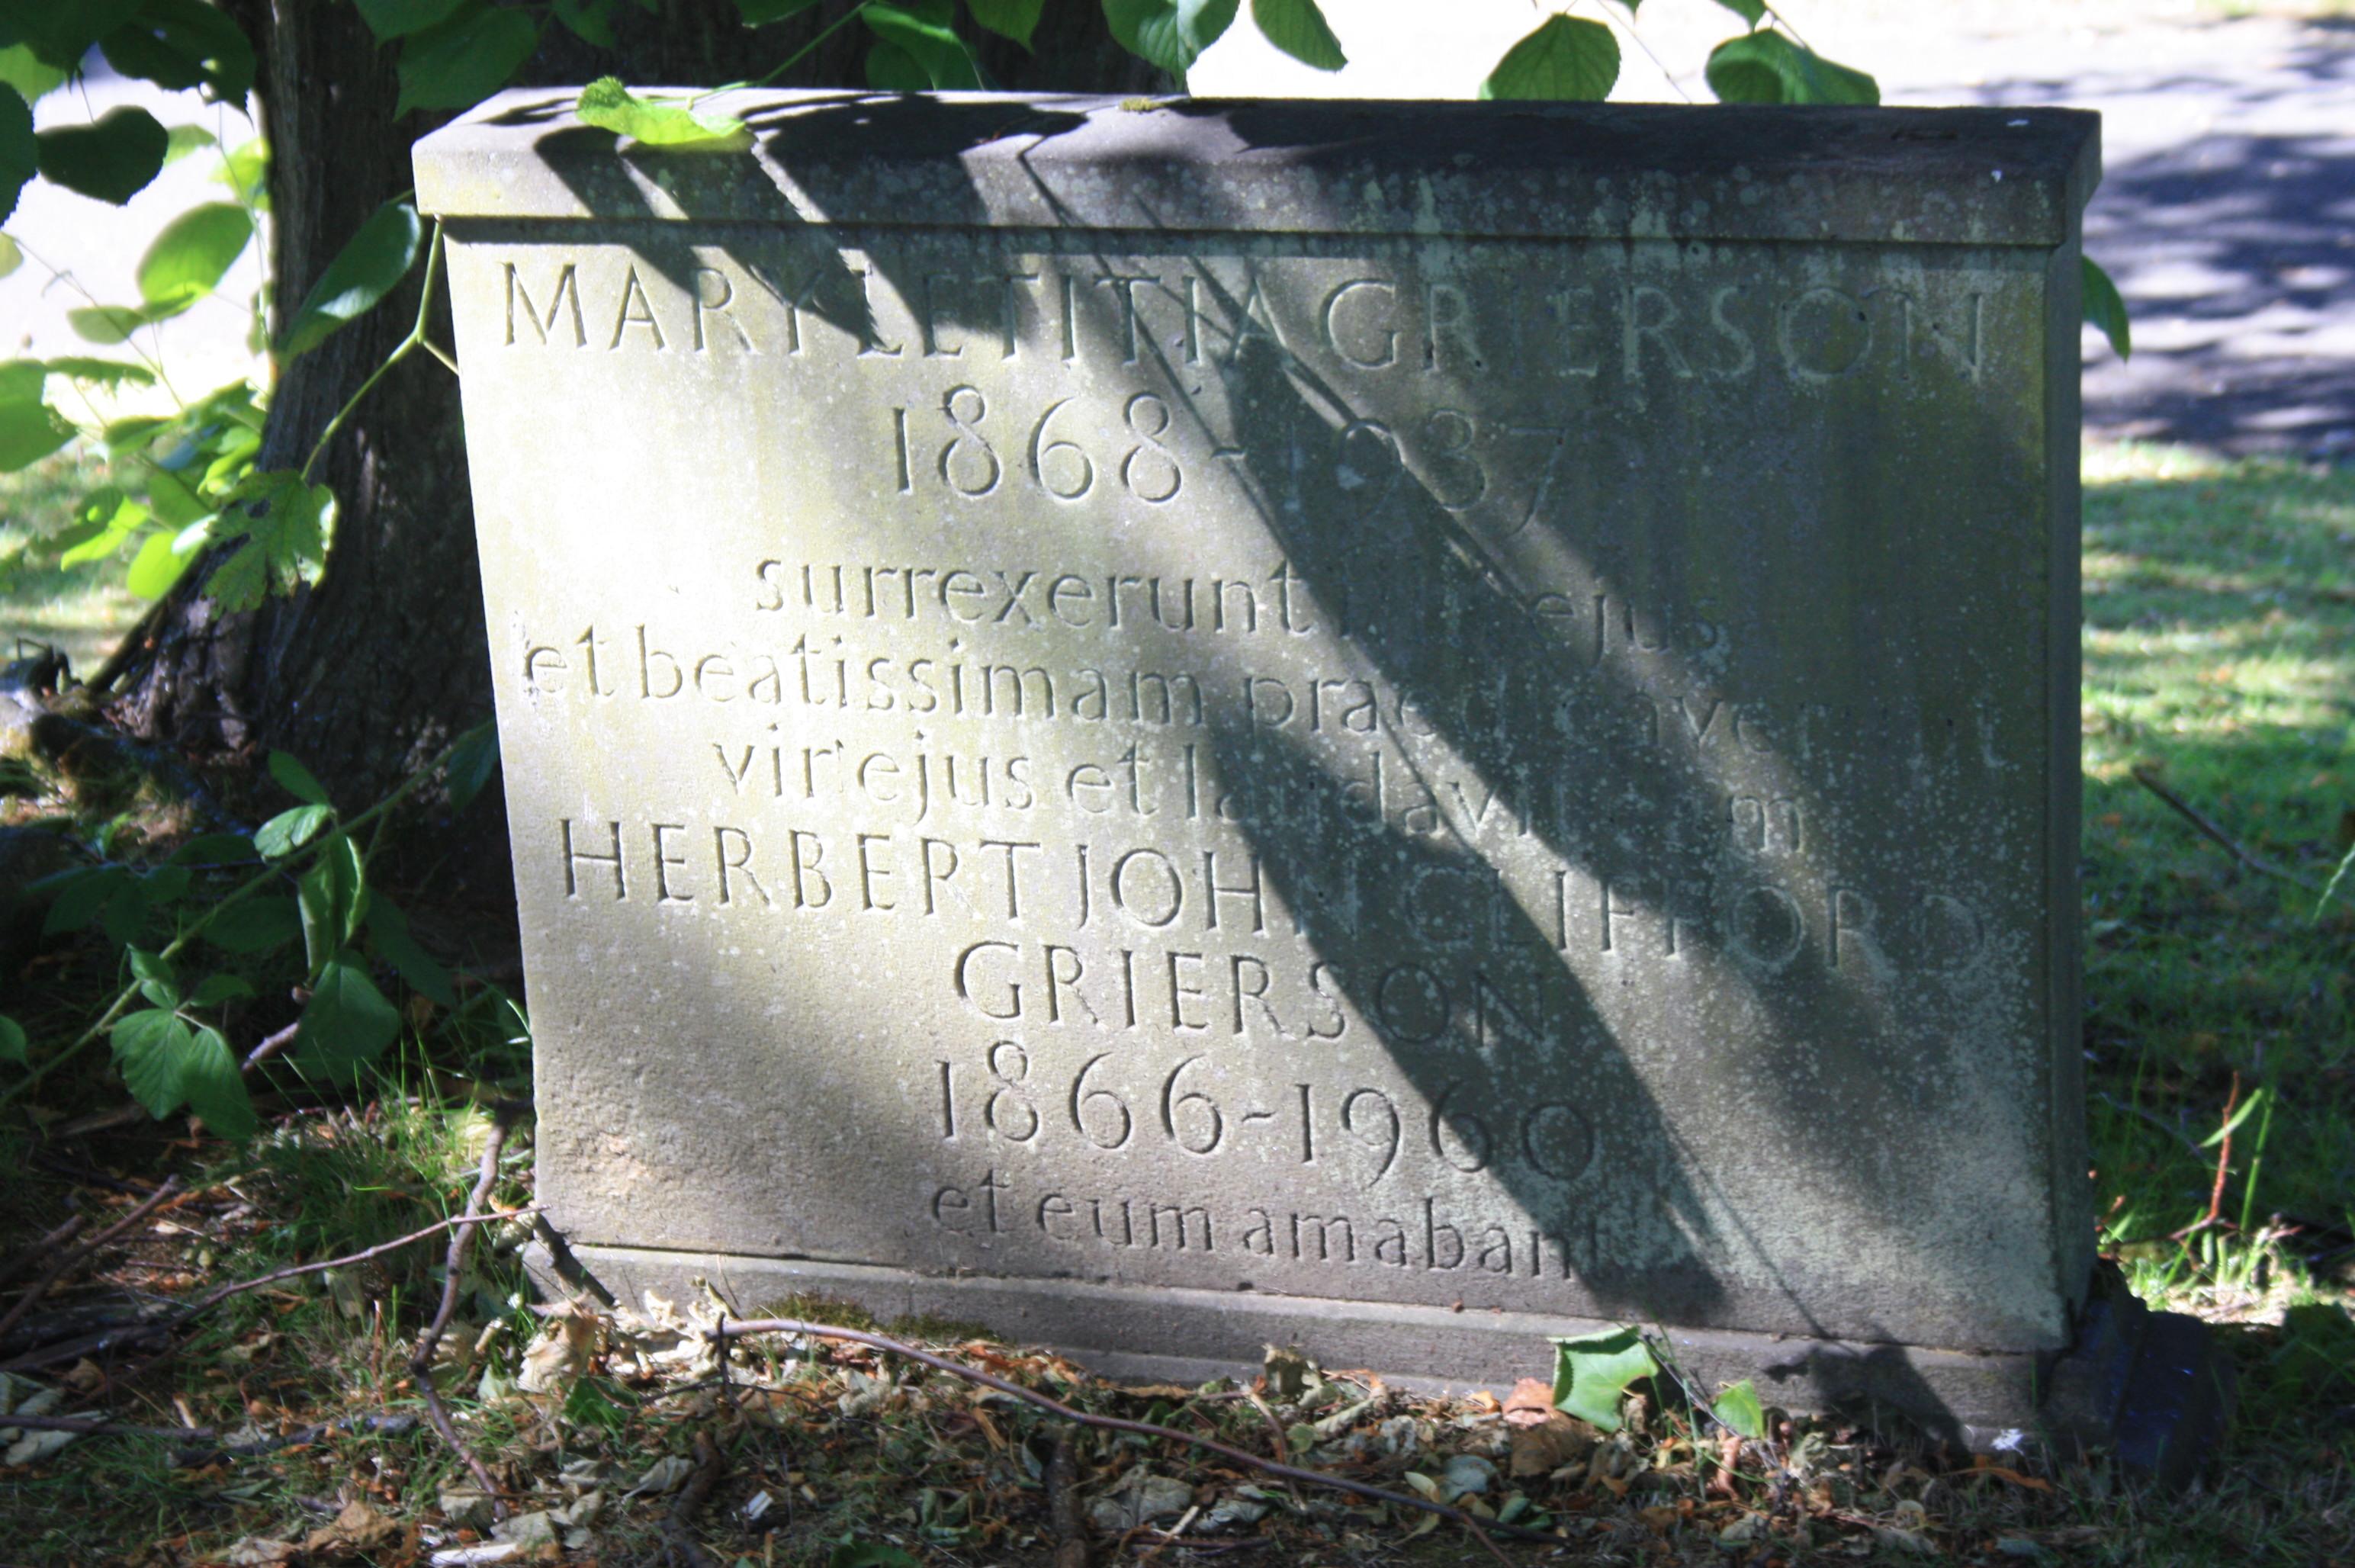 The grave of Herbert Grierson, Dean Cemetery